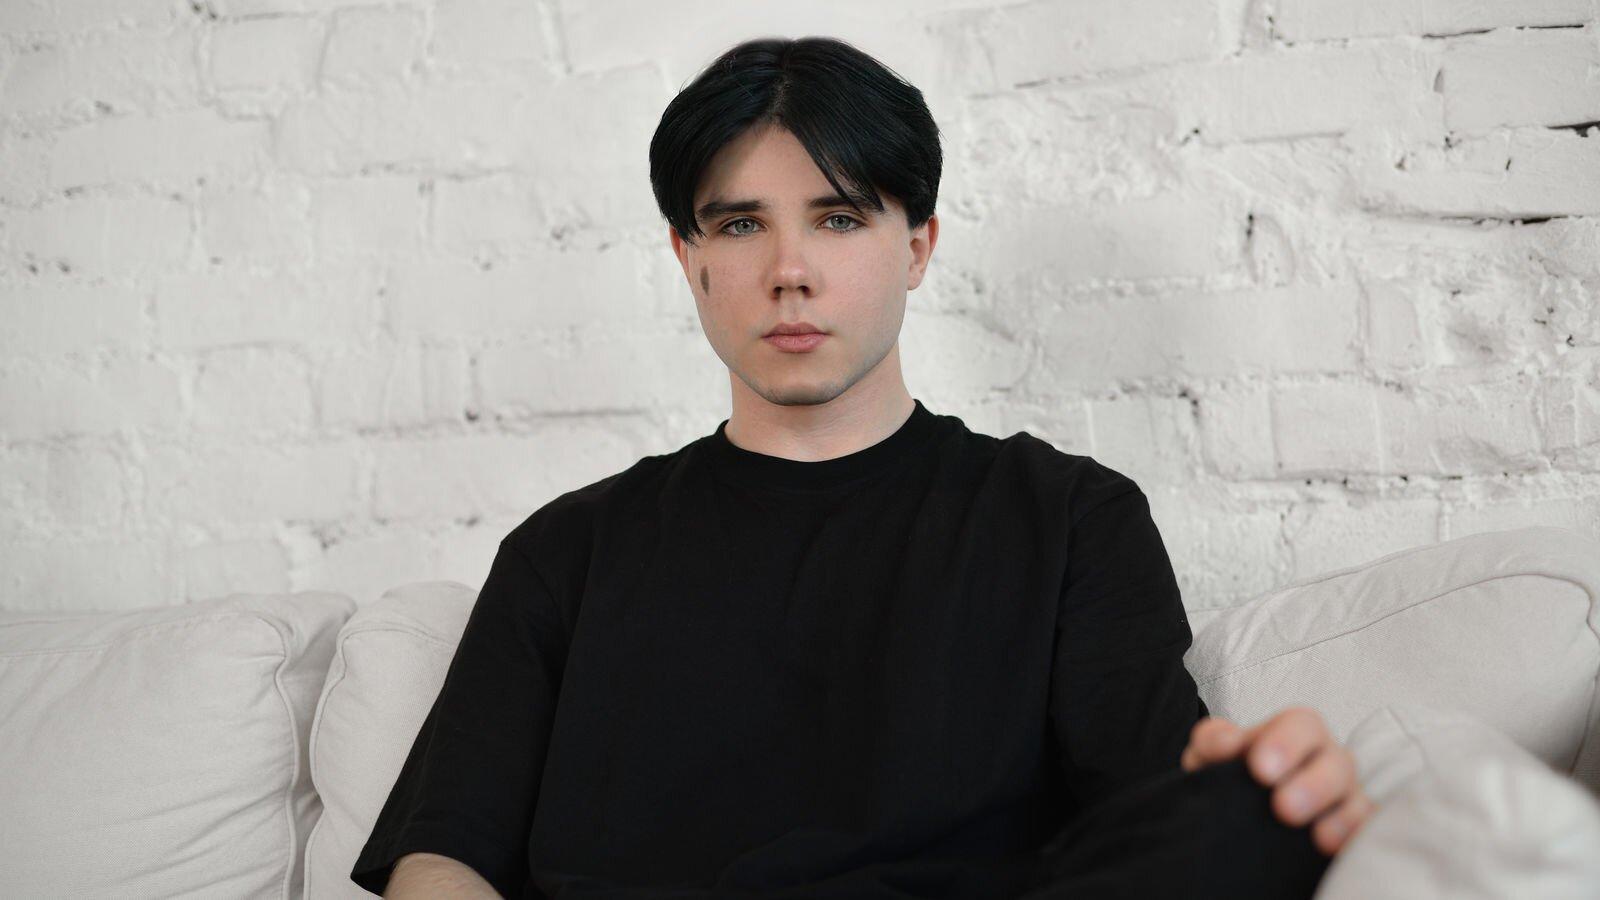 StefanMiller